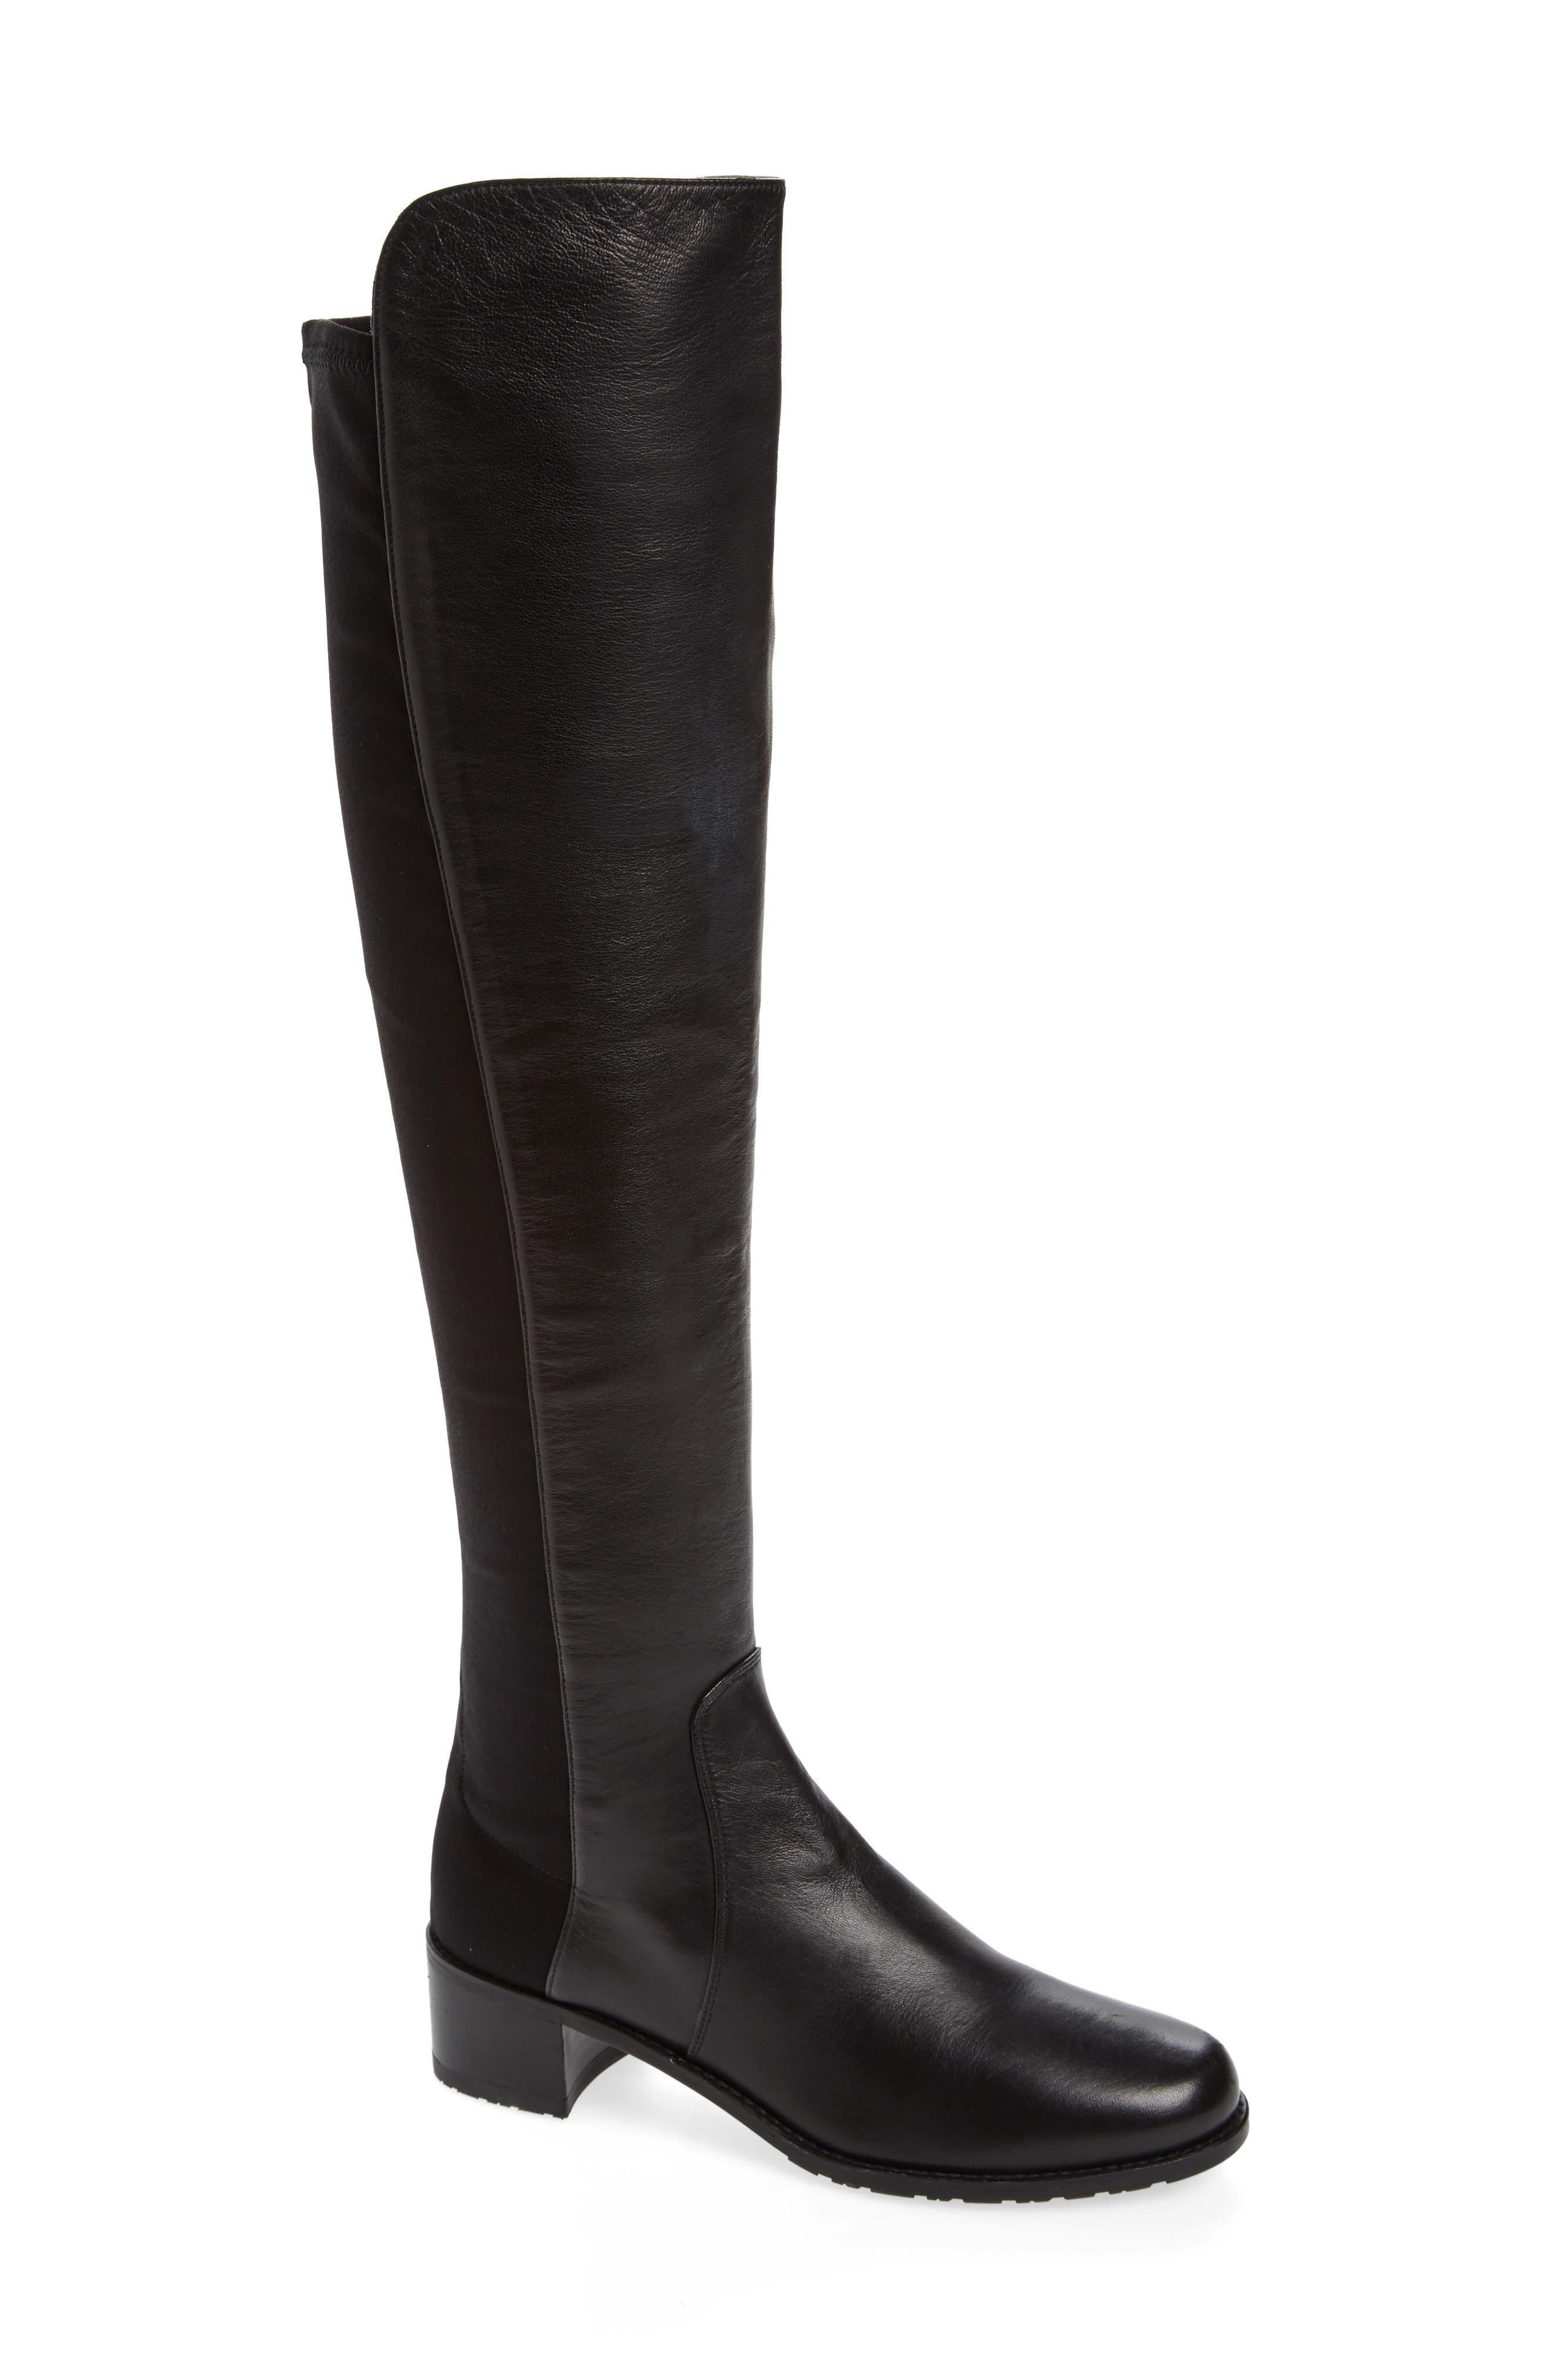 STUART WEITZMAN 'Reserve' Over the Knee Boot, Main, color, BLACK NAPPA